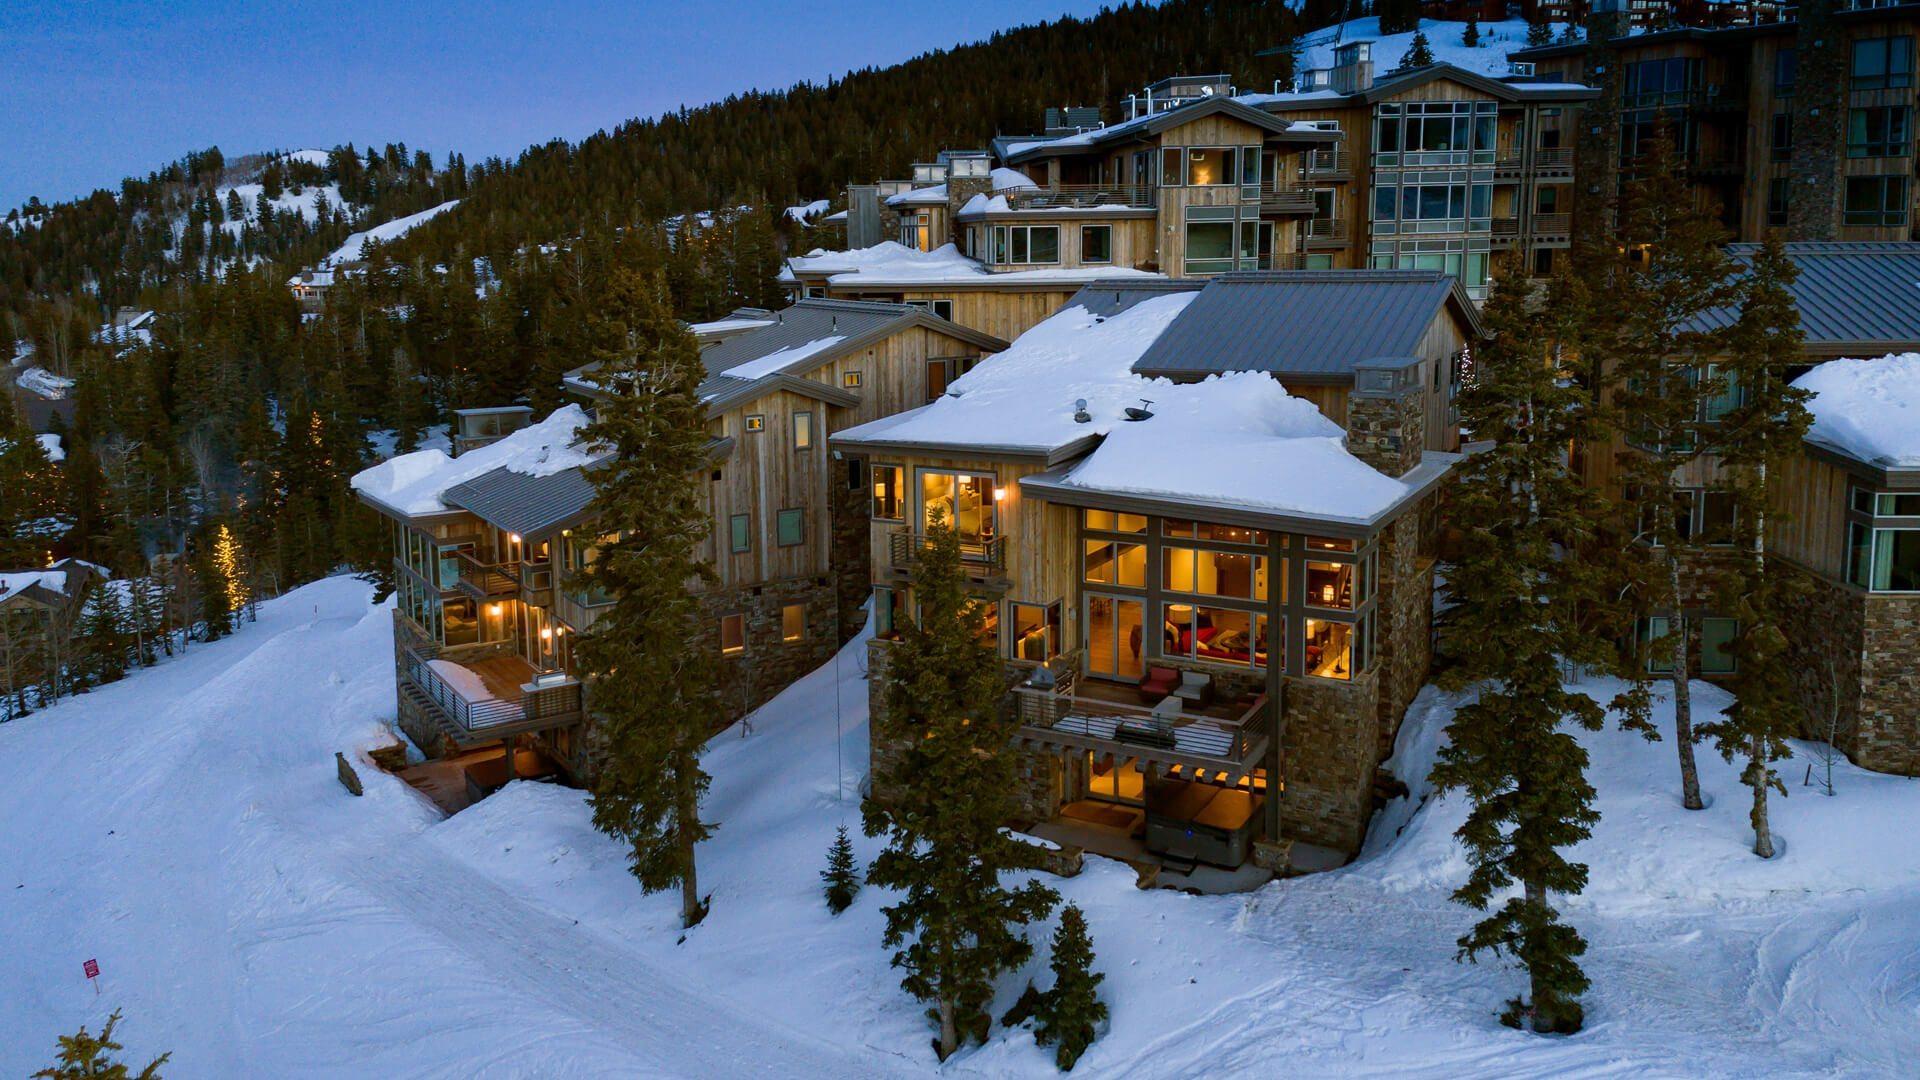 Marc-Michaels Rustic Modern Design Lodge